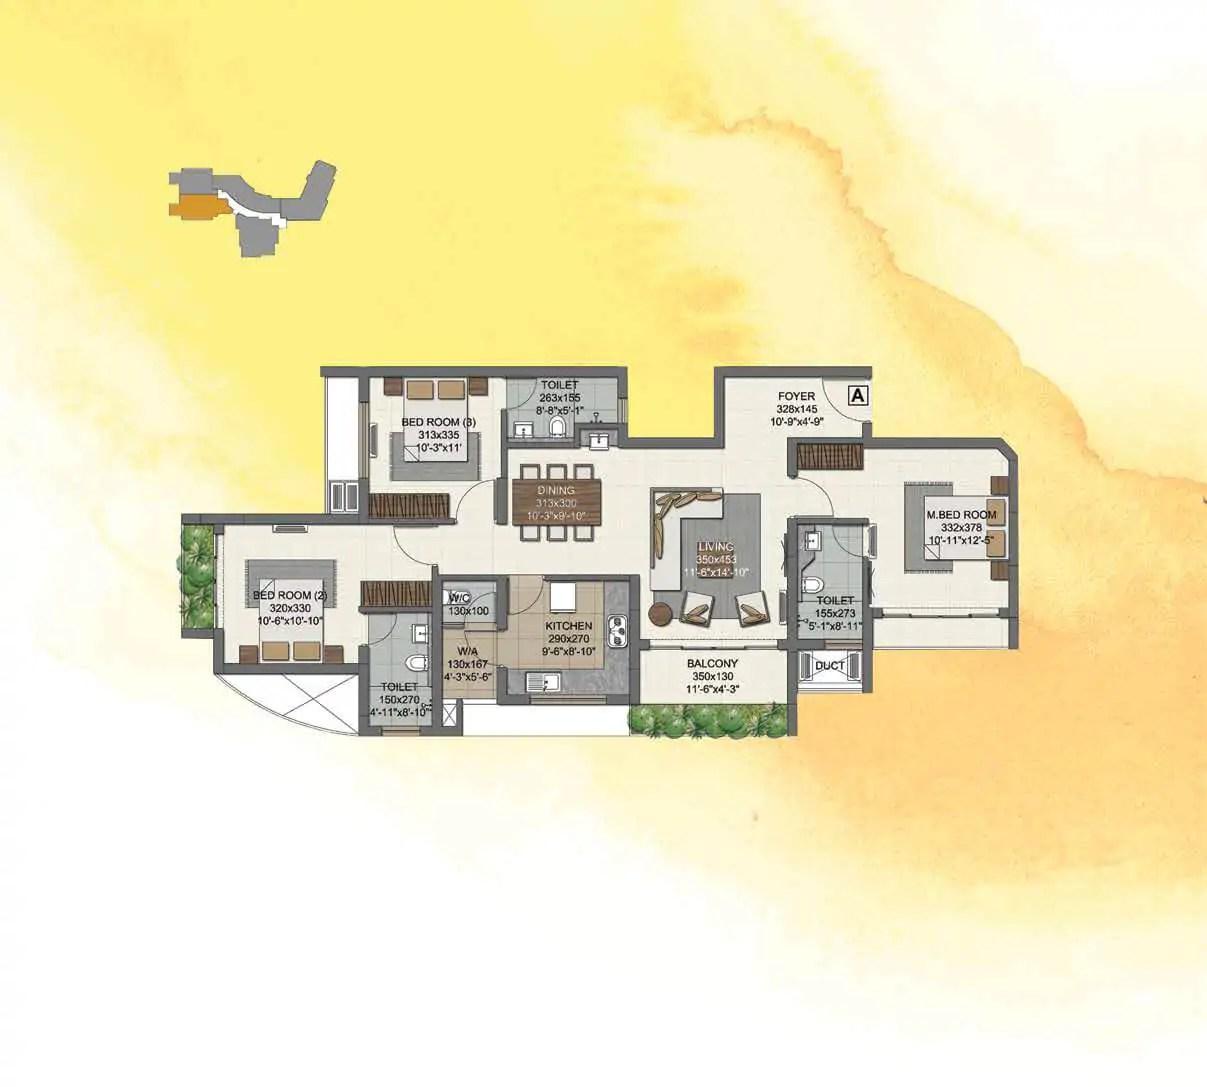 UNIT A (3 BHK) 1ST-12TH FLOORS